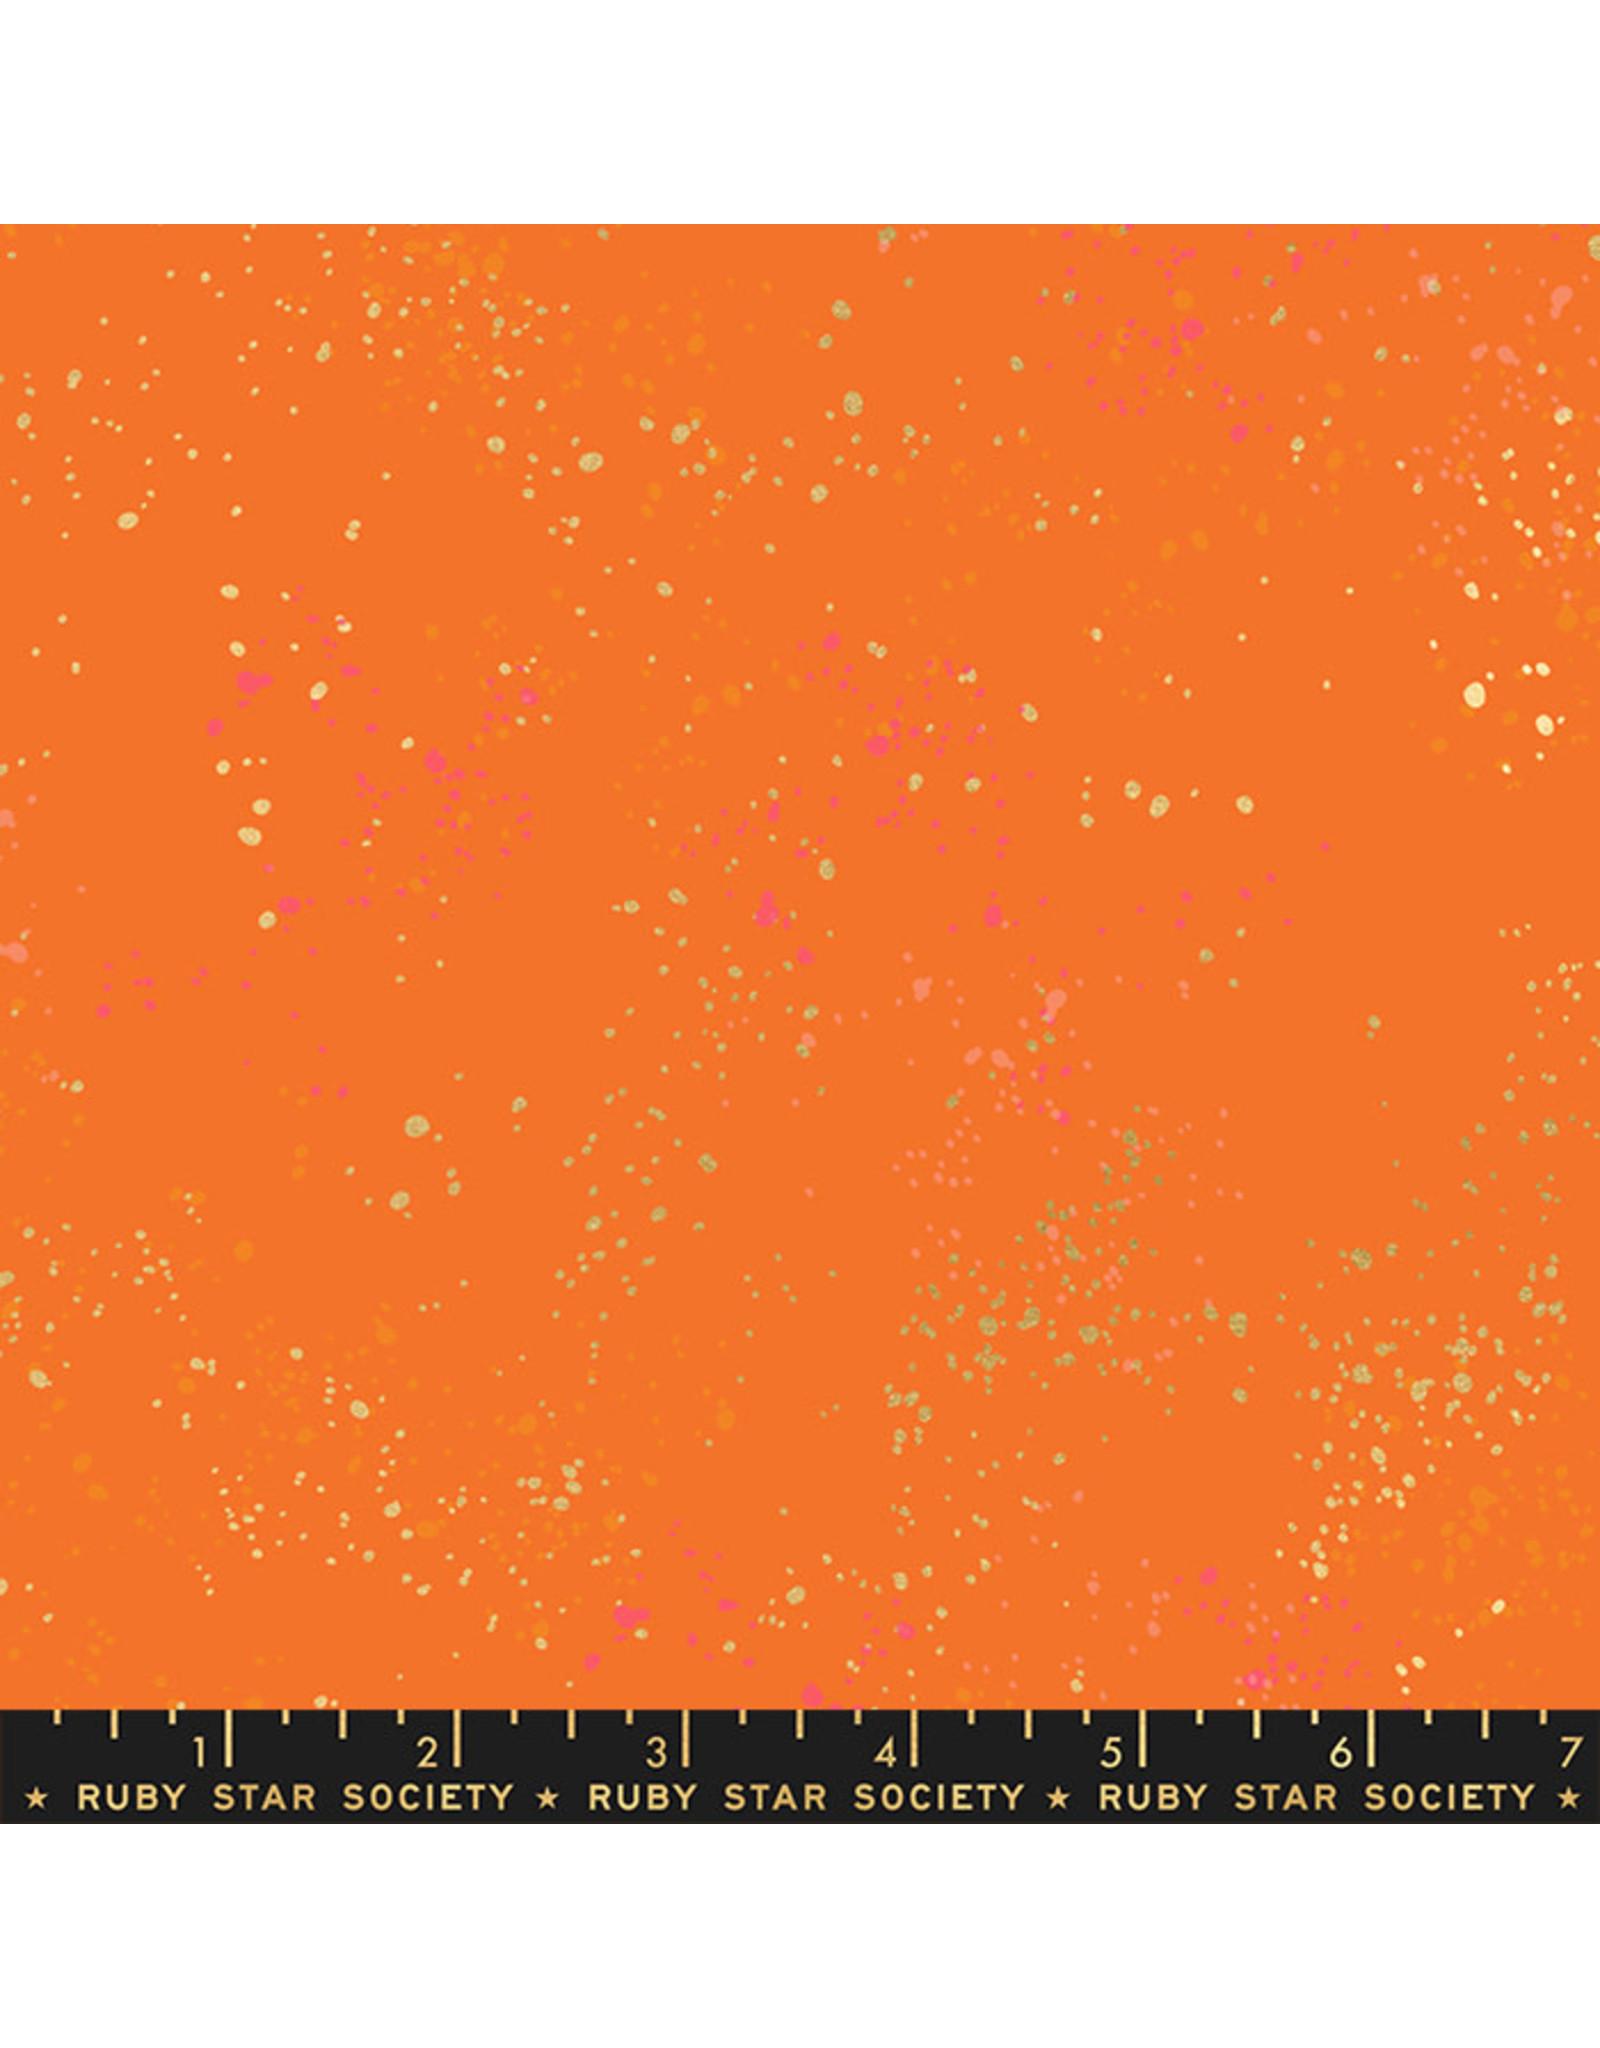 Rashida Coleman-Hale Ruby Star Society, Speckled New in Burnt Orange, Fabric Half-Yards